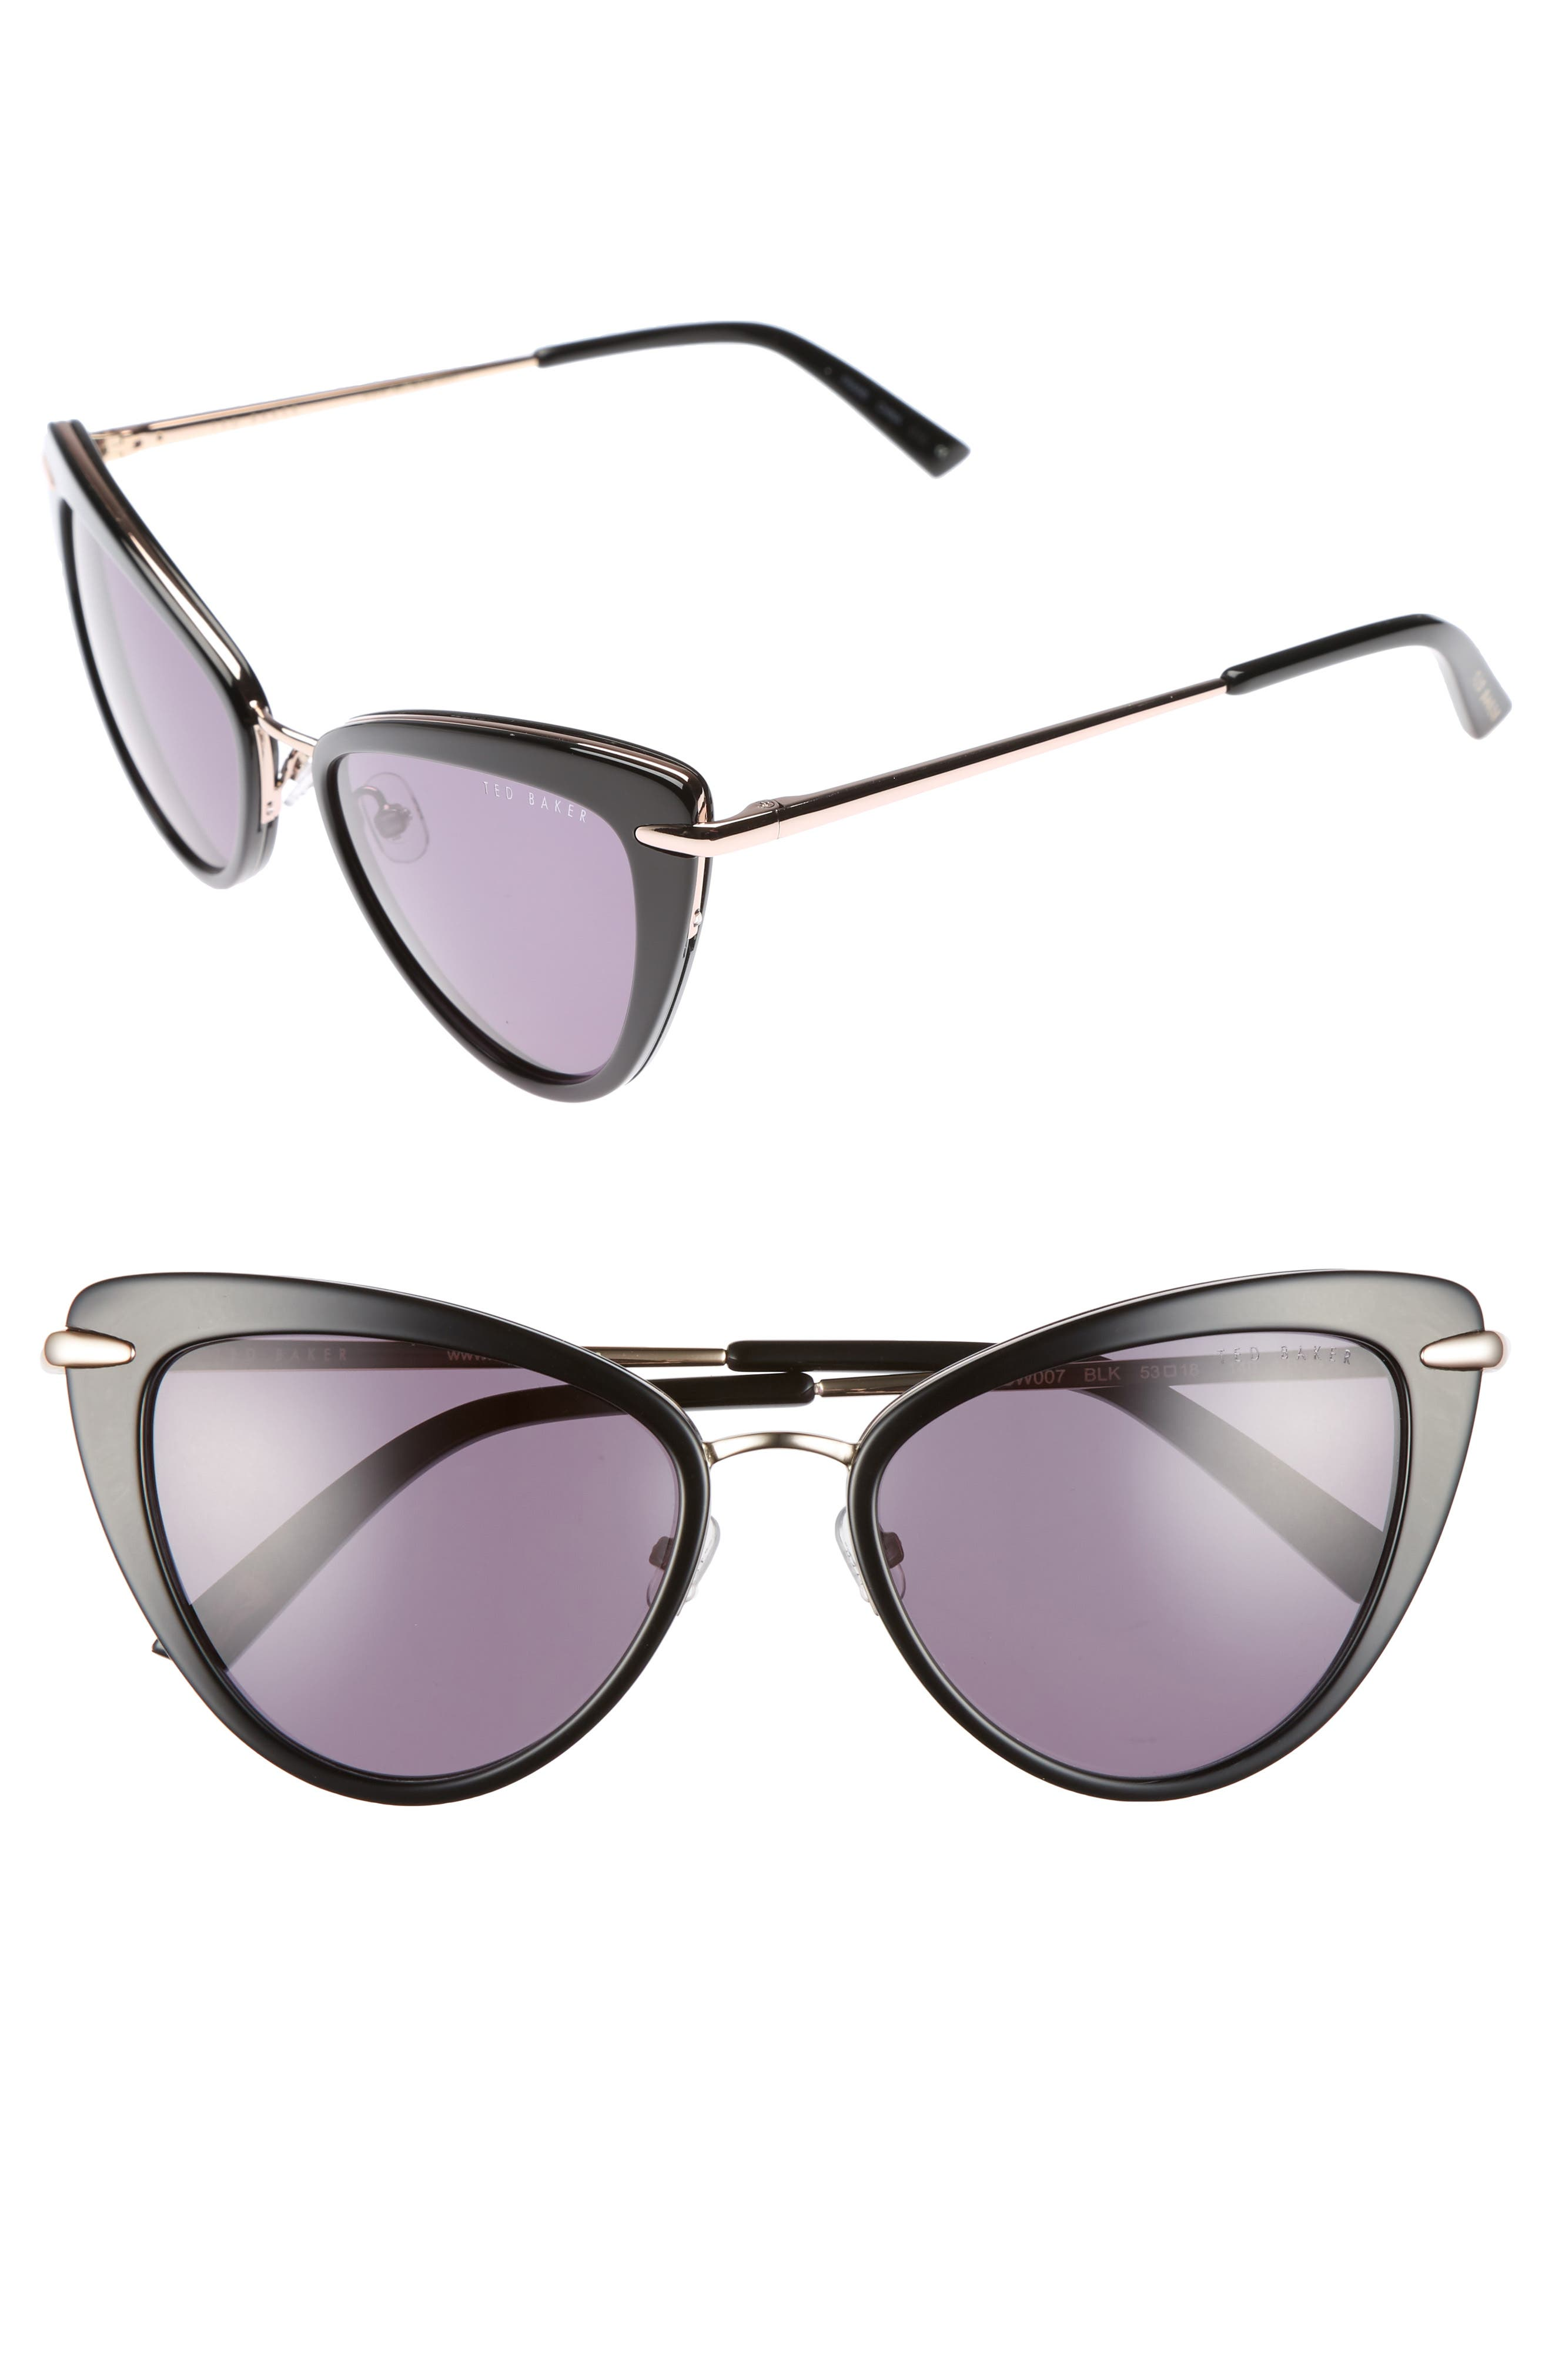 53mm Cat Eye Sunglasses,                         Main,                         color, Black